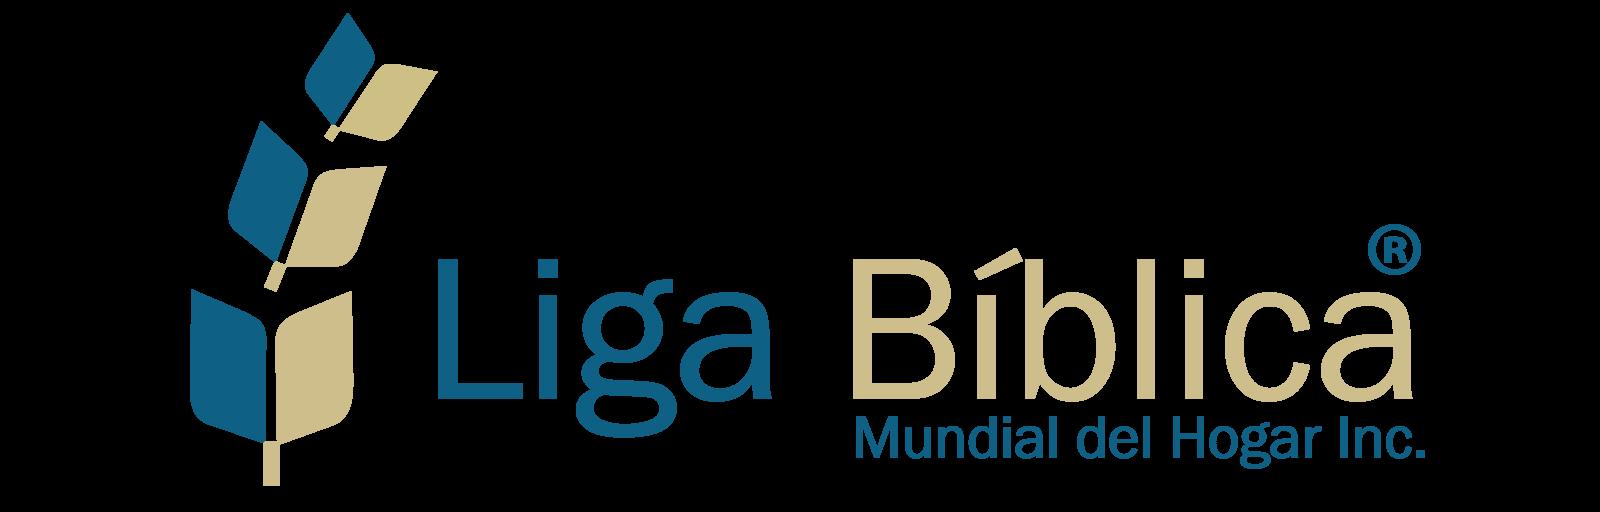 LIGA BIBLICA MUNDIAL DEL HOGAR INC